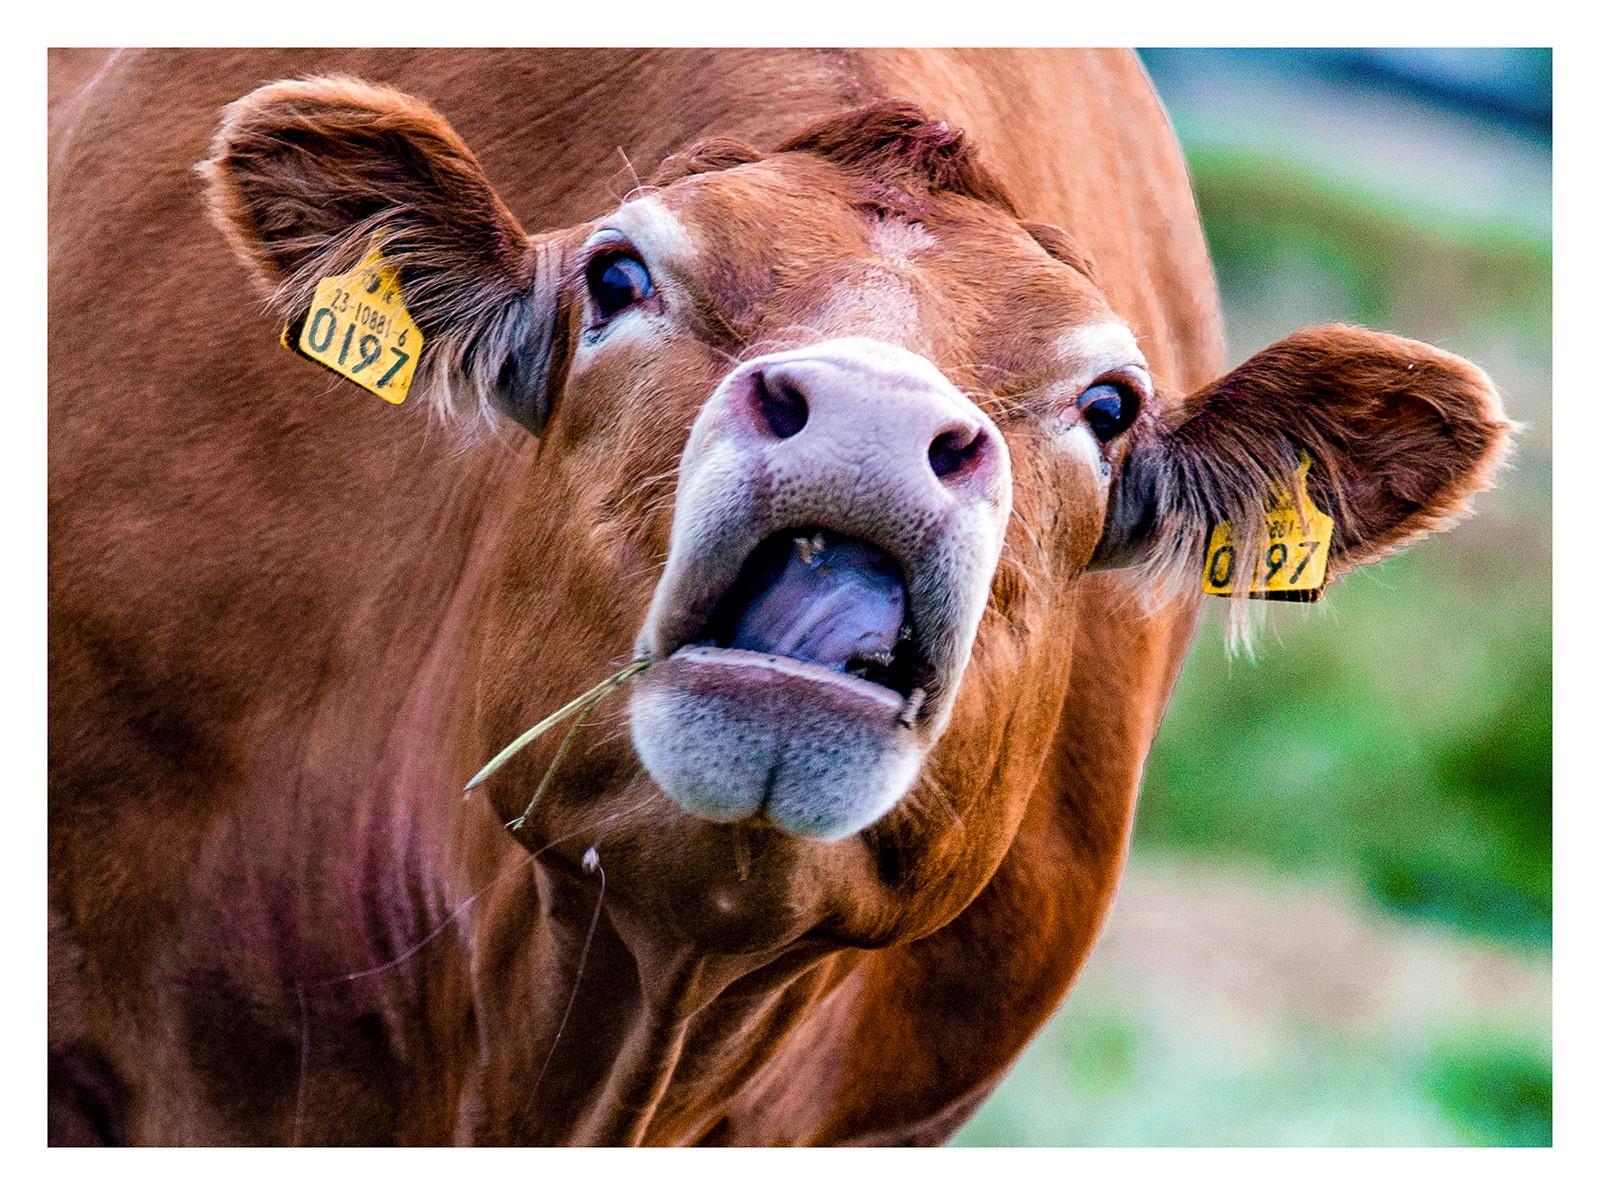 PDI - Cow by Brenda Taylor (9 marks)